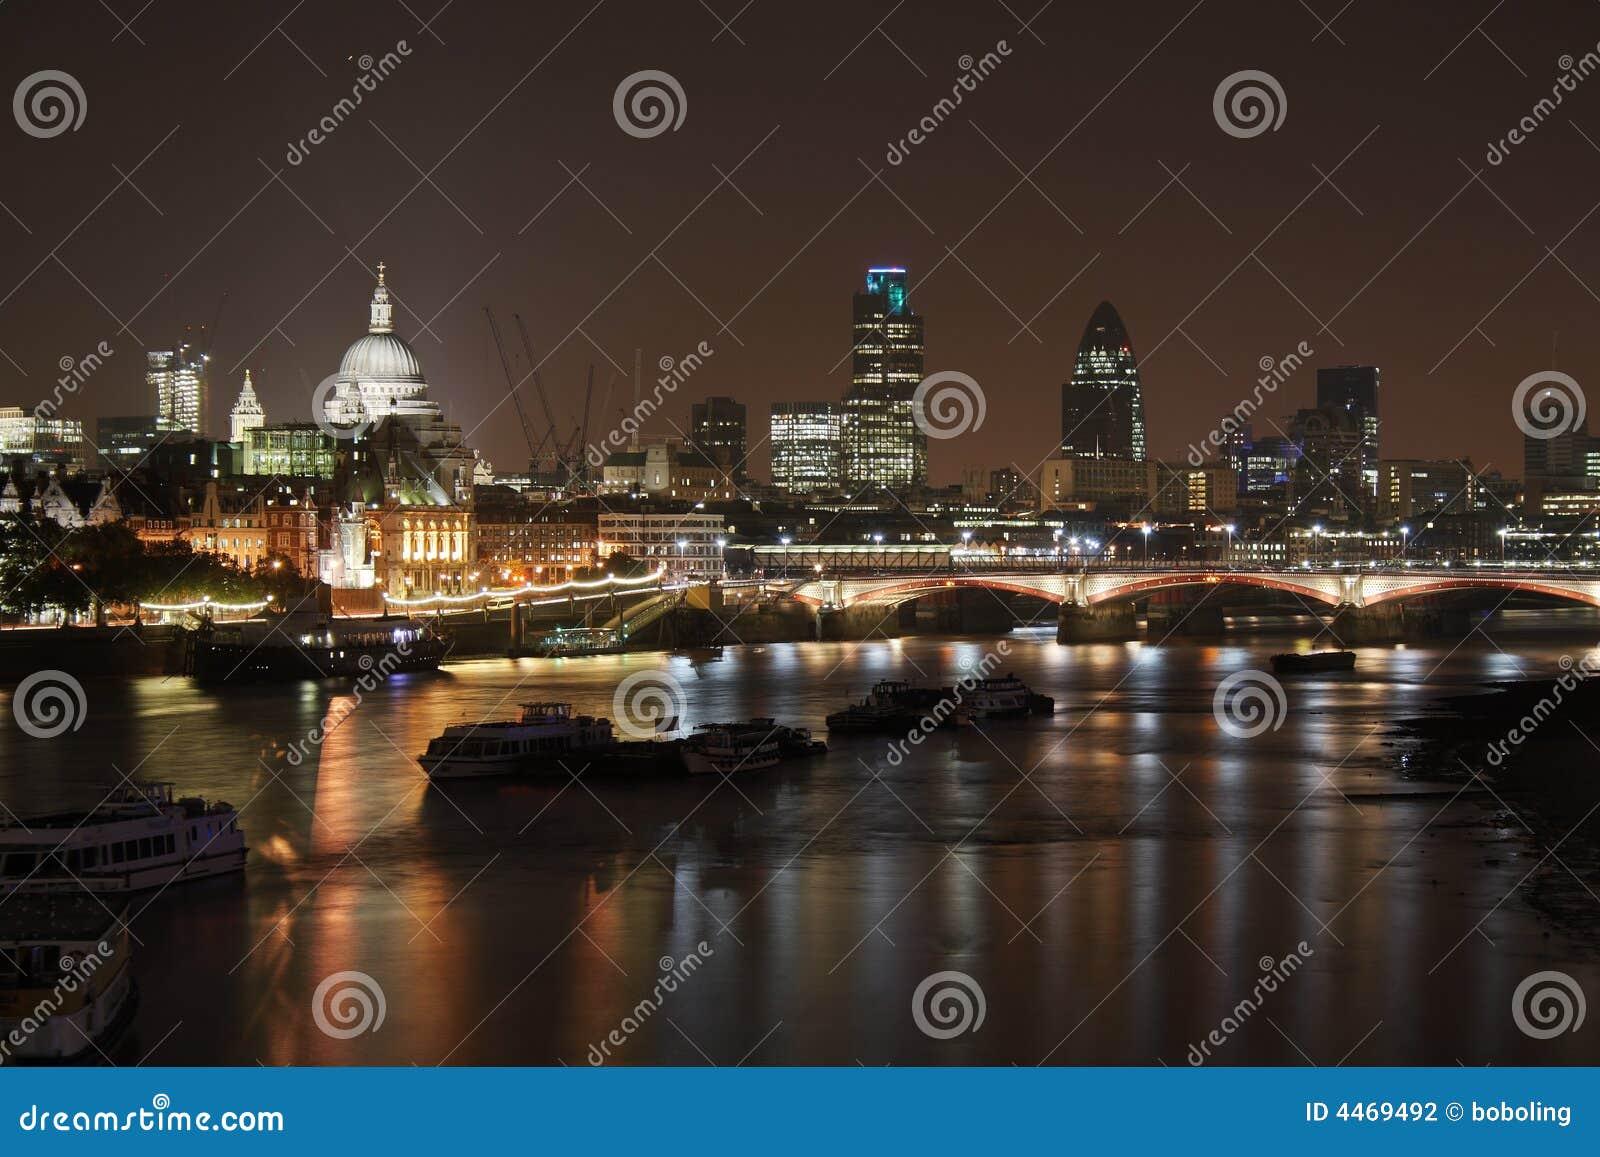 London night scene